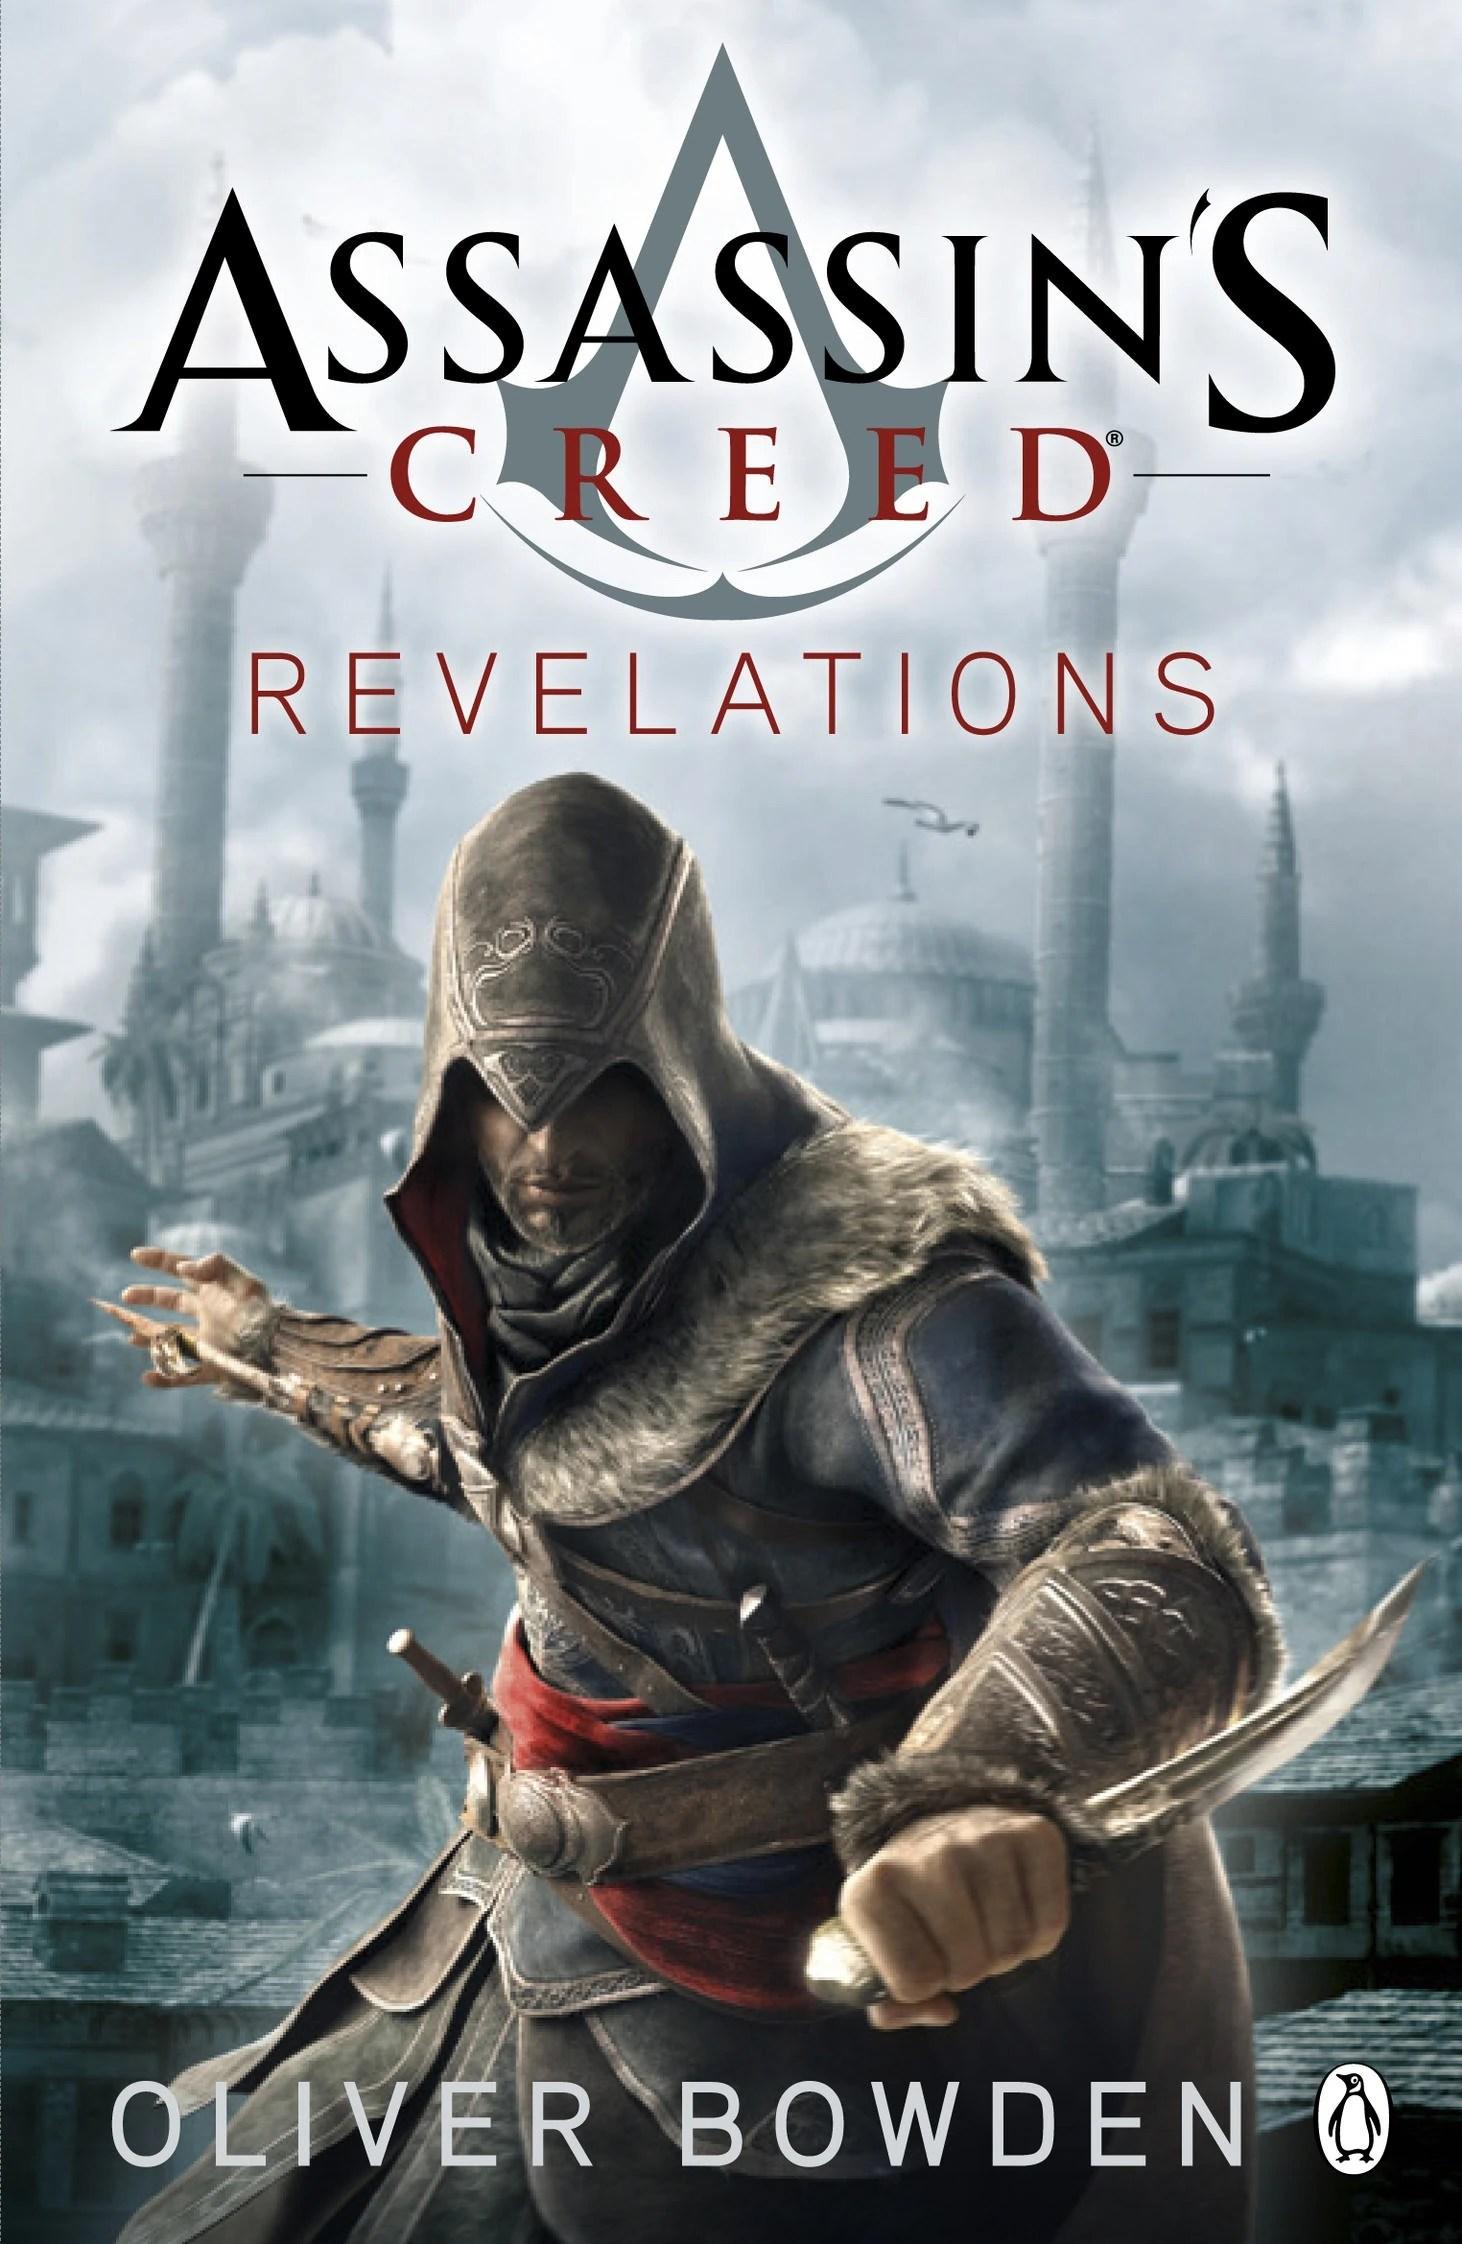 Assassin's Creed: Revelations (novel) | Assassin's Creed ...